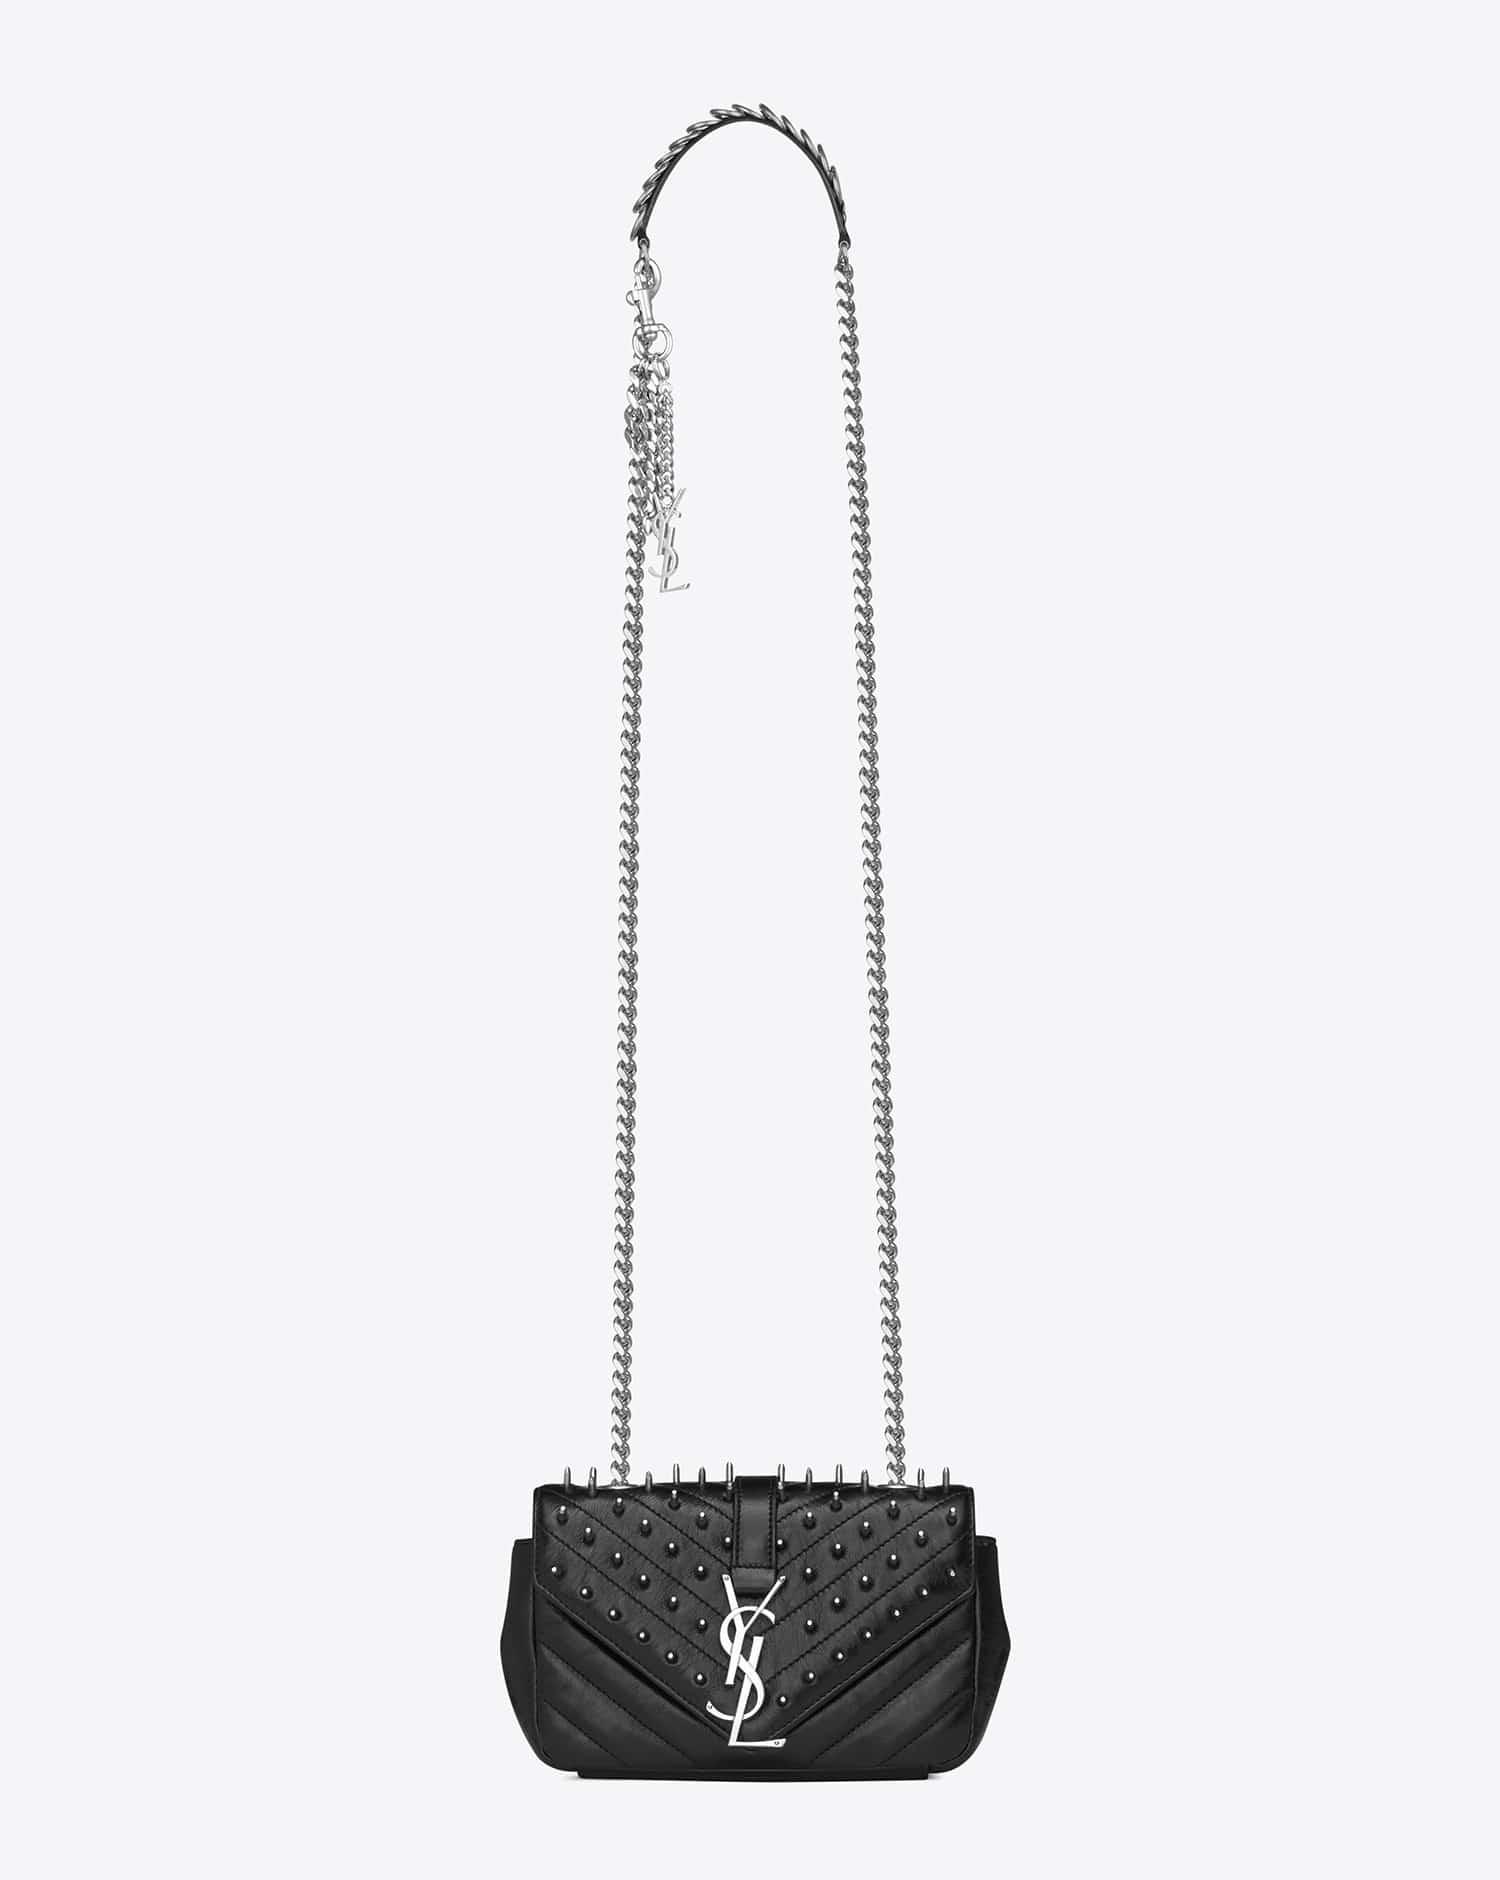 Saint Laurent Fall Winter 2015 Bag Collection Featuring Punk Chain ... a4ba41d7c4338